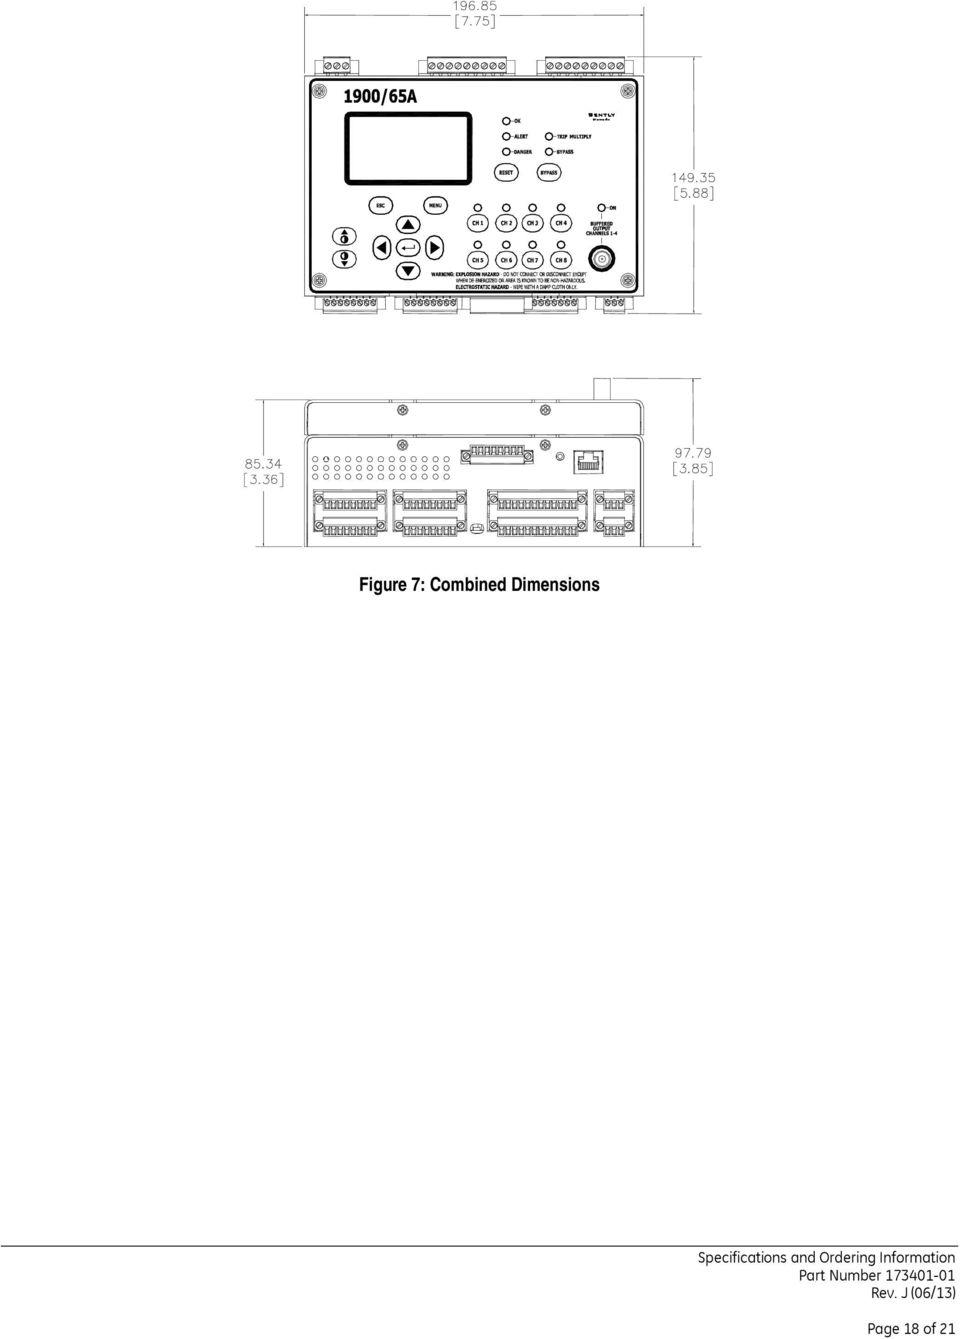 medium resolution of  1900 65a general purpose equipment monitor pdf on hvac diagrams motor diagrams